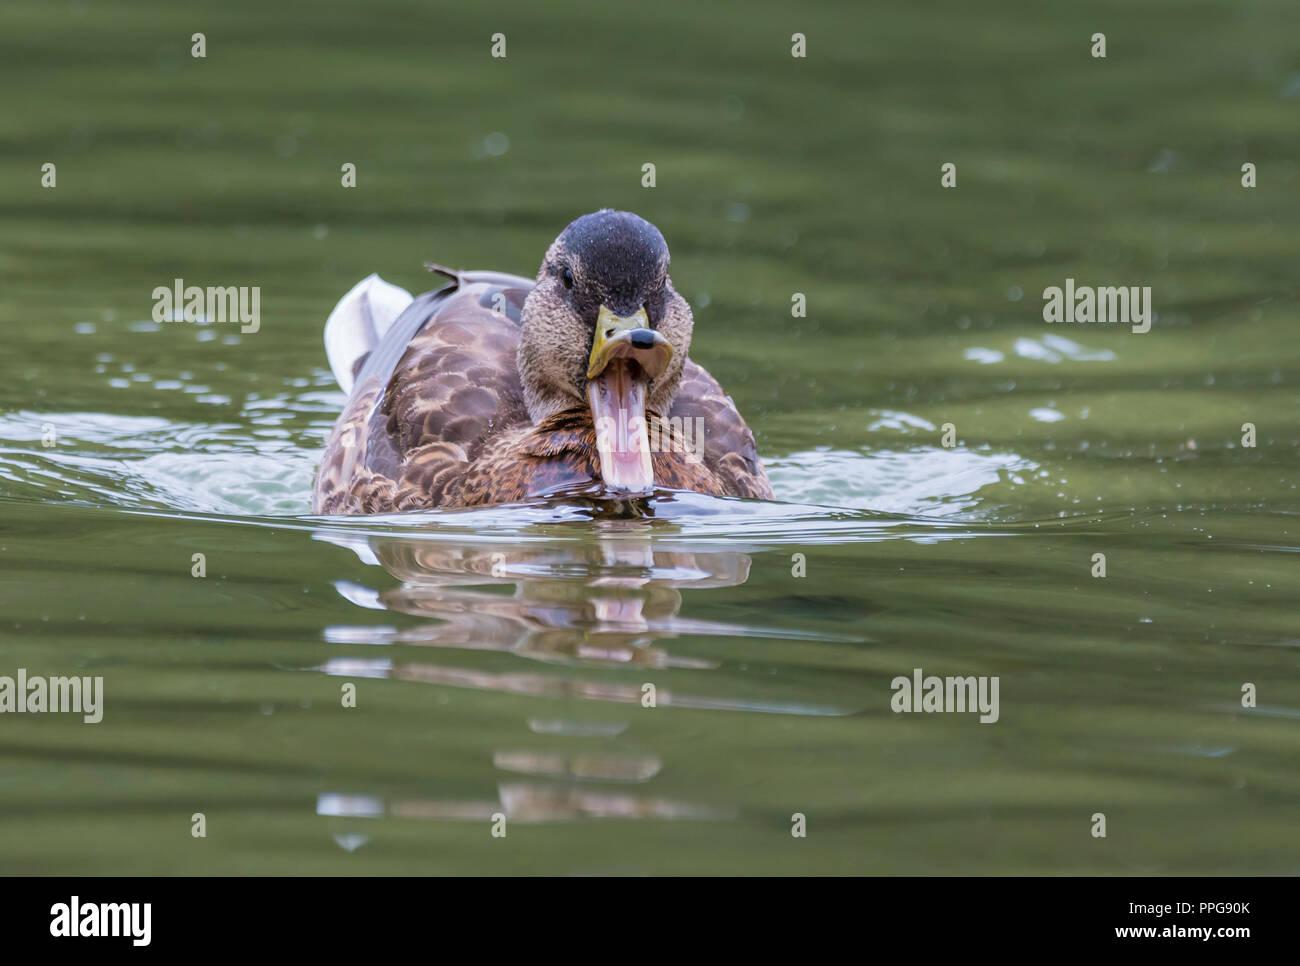 Hen (female) Mallard Duck (Anas platyrhynchos) swimming on water facing front with beak (bill) wide open, in Summer in West Sussex, UK. - Stock Image